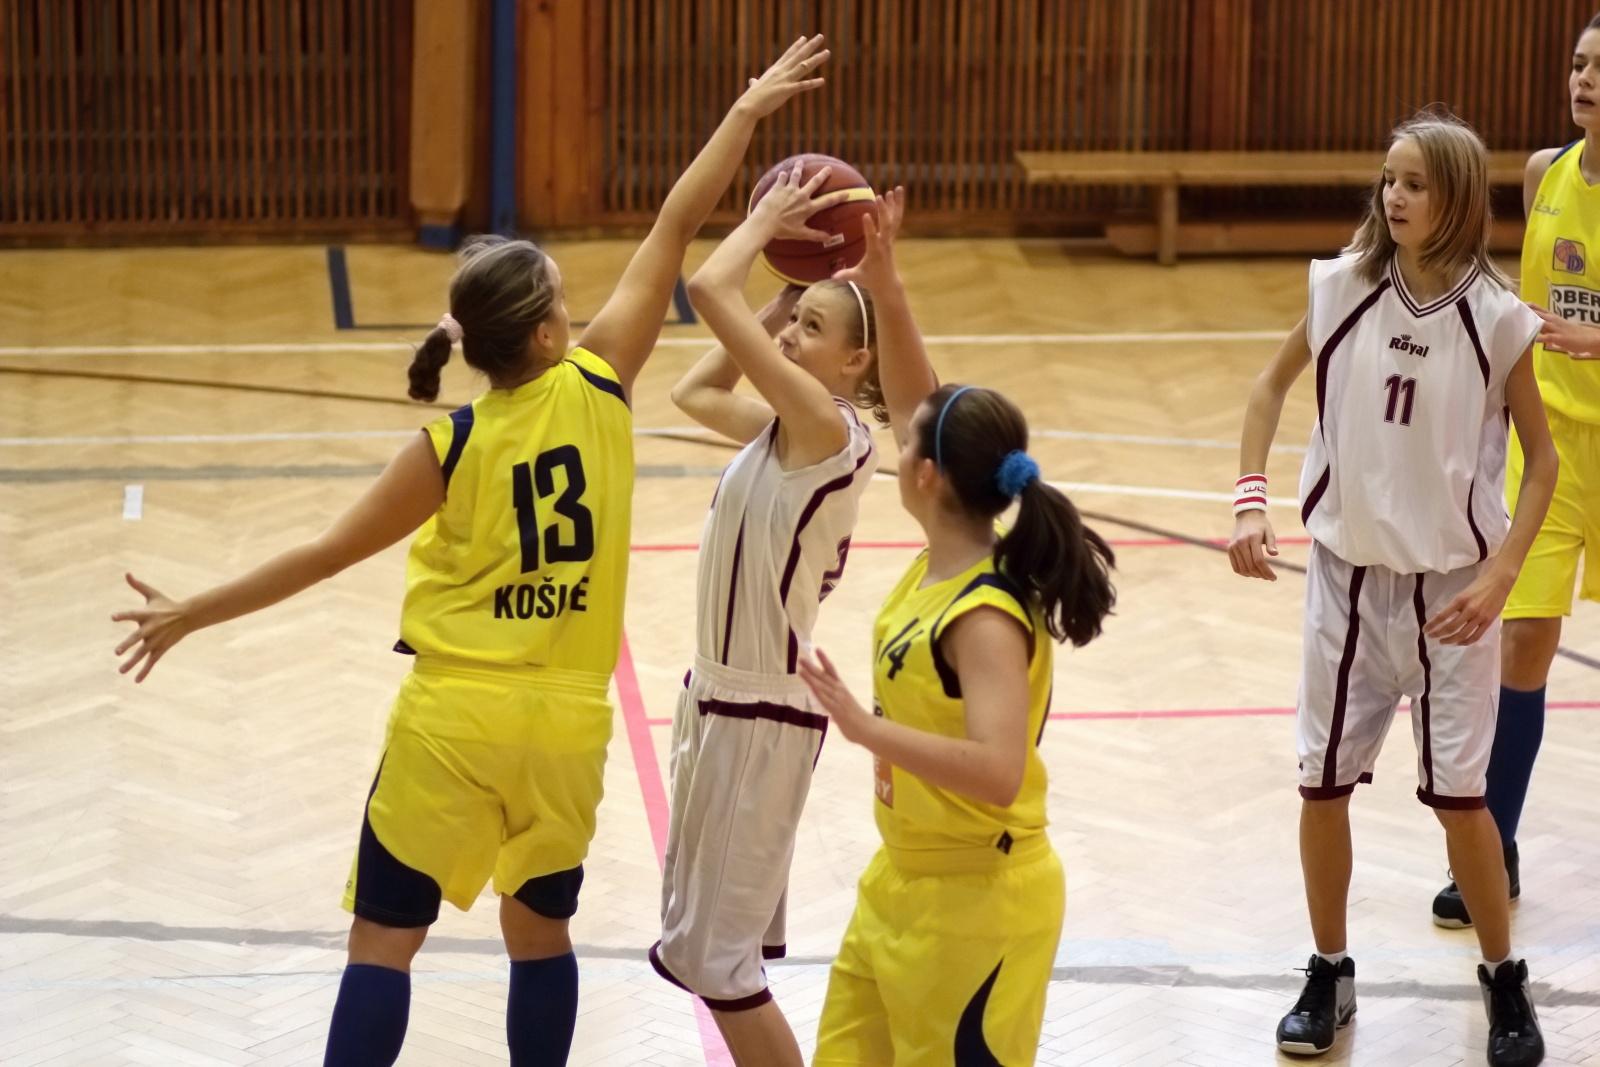 bk-zvolen-tydam-kosice-ziacky-basketbal-2011-16